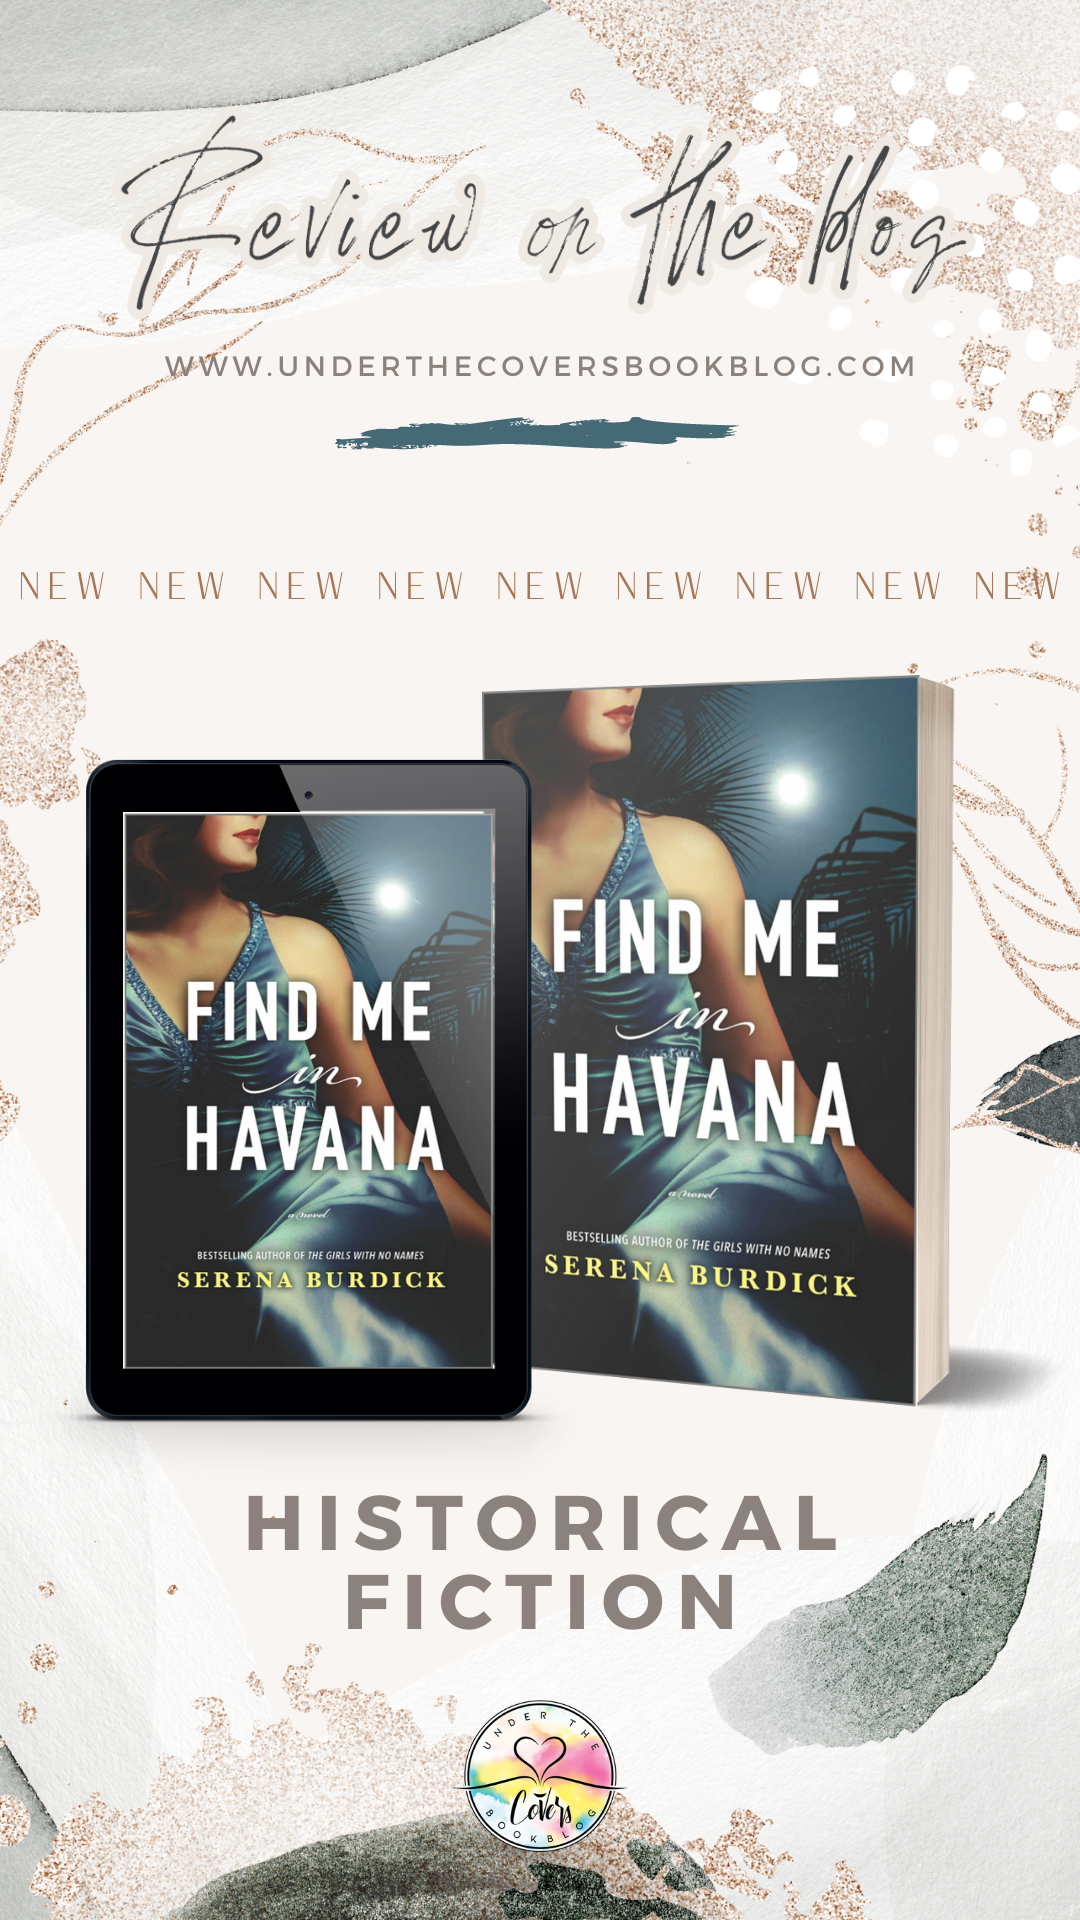 ARC Review: Find Me in Havana by Serena Burdick